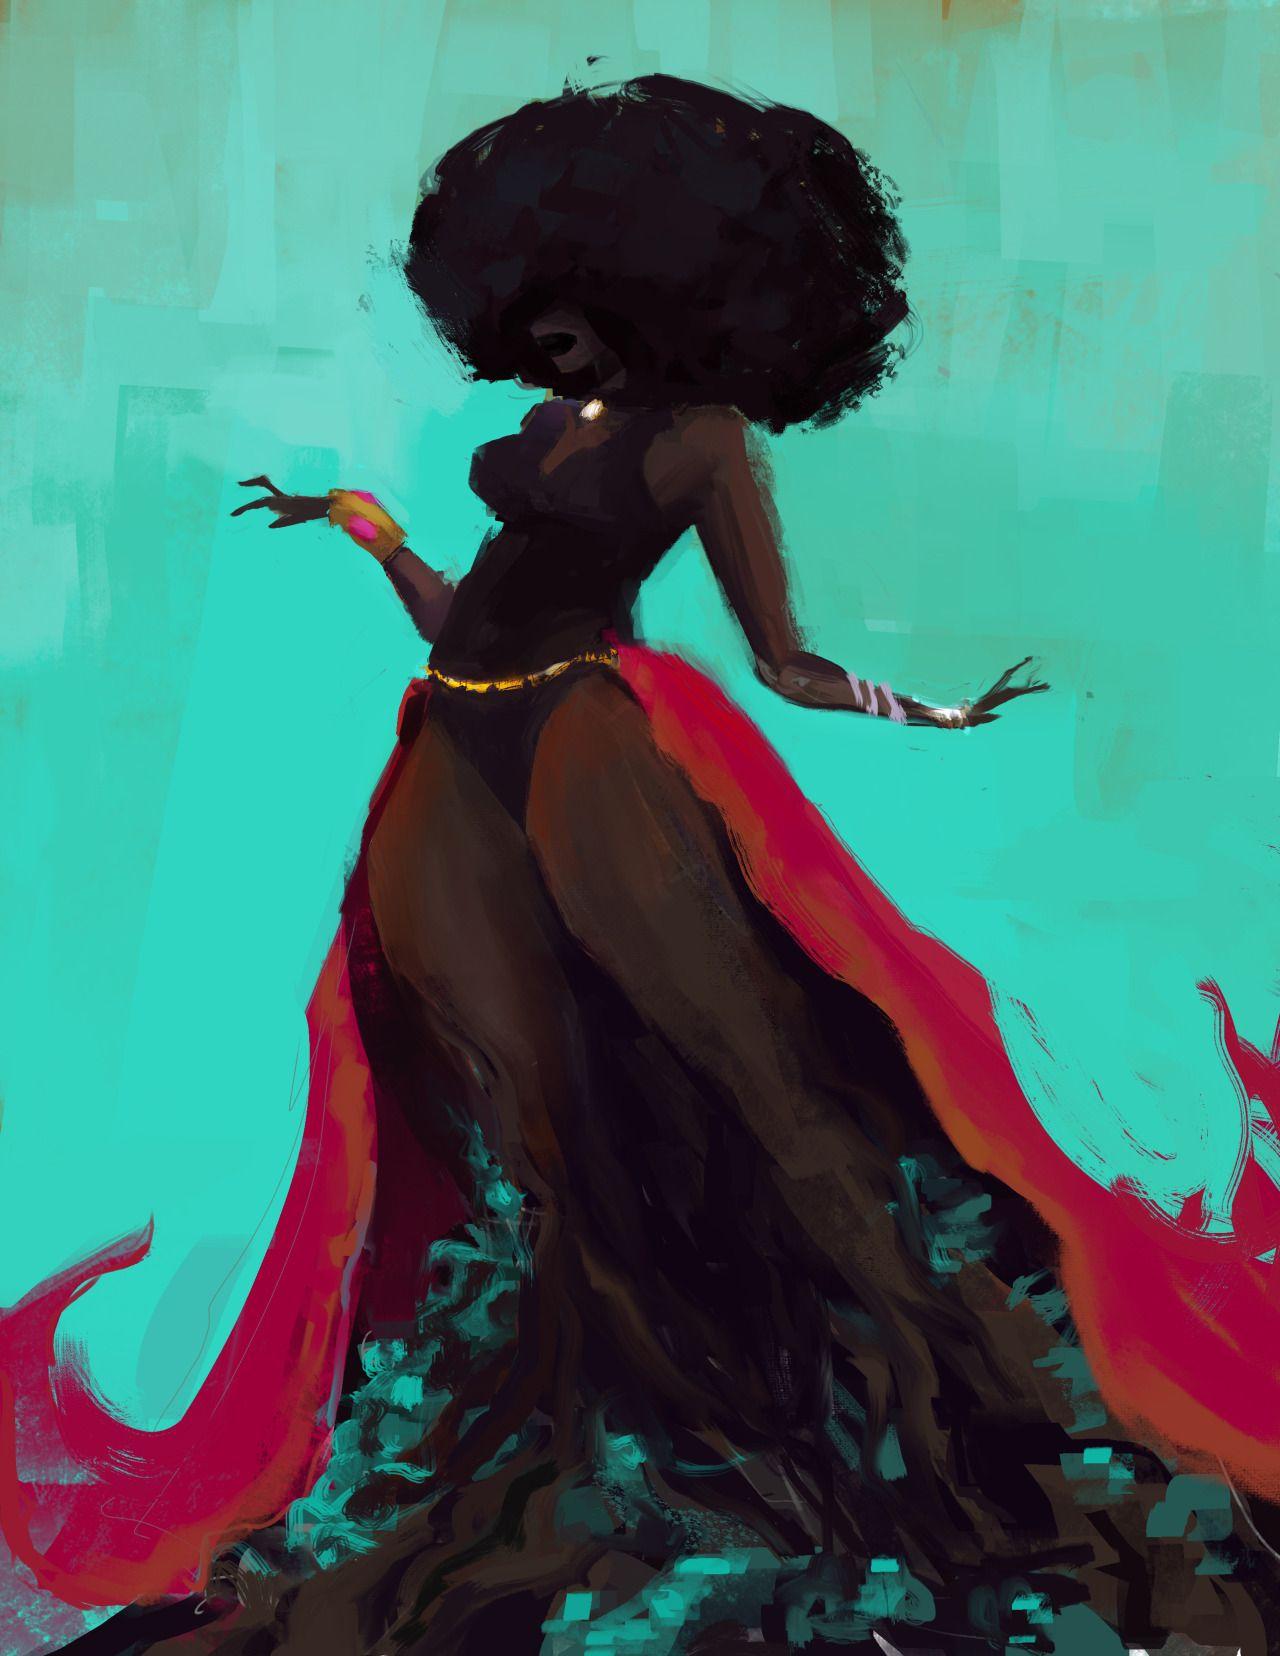 Sexy black women art